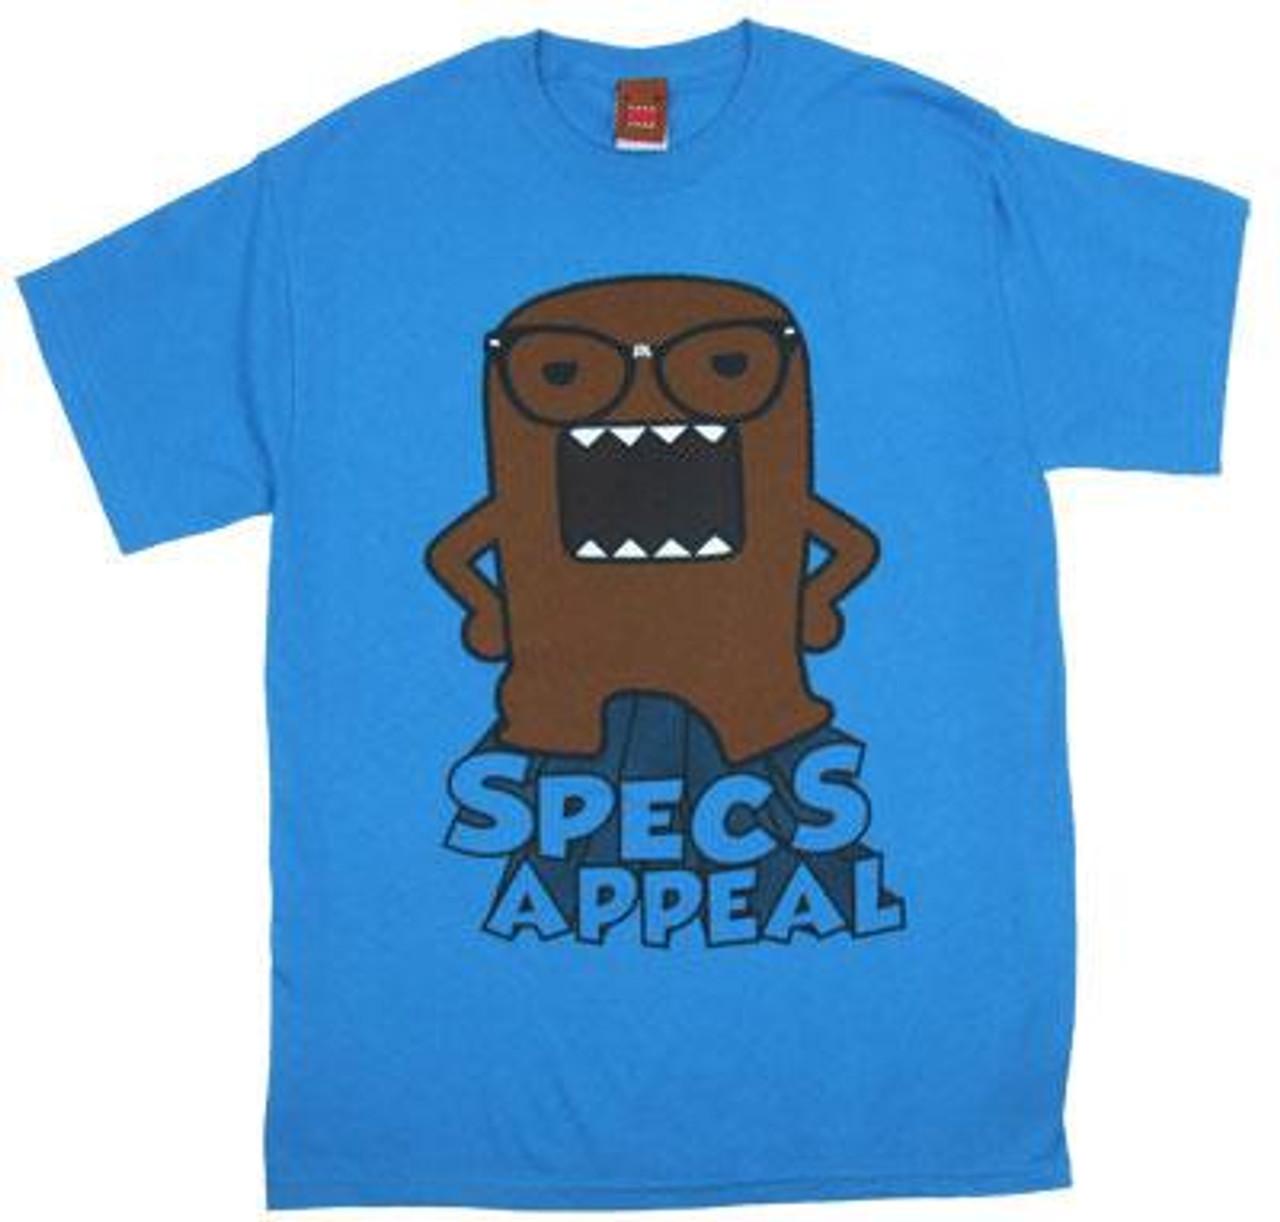 Domo Appealed T-Shirt [Adult Medium]